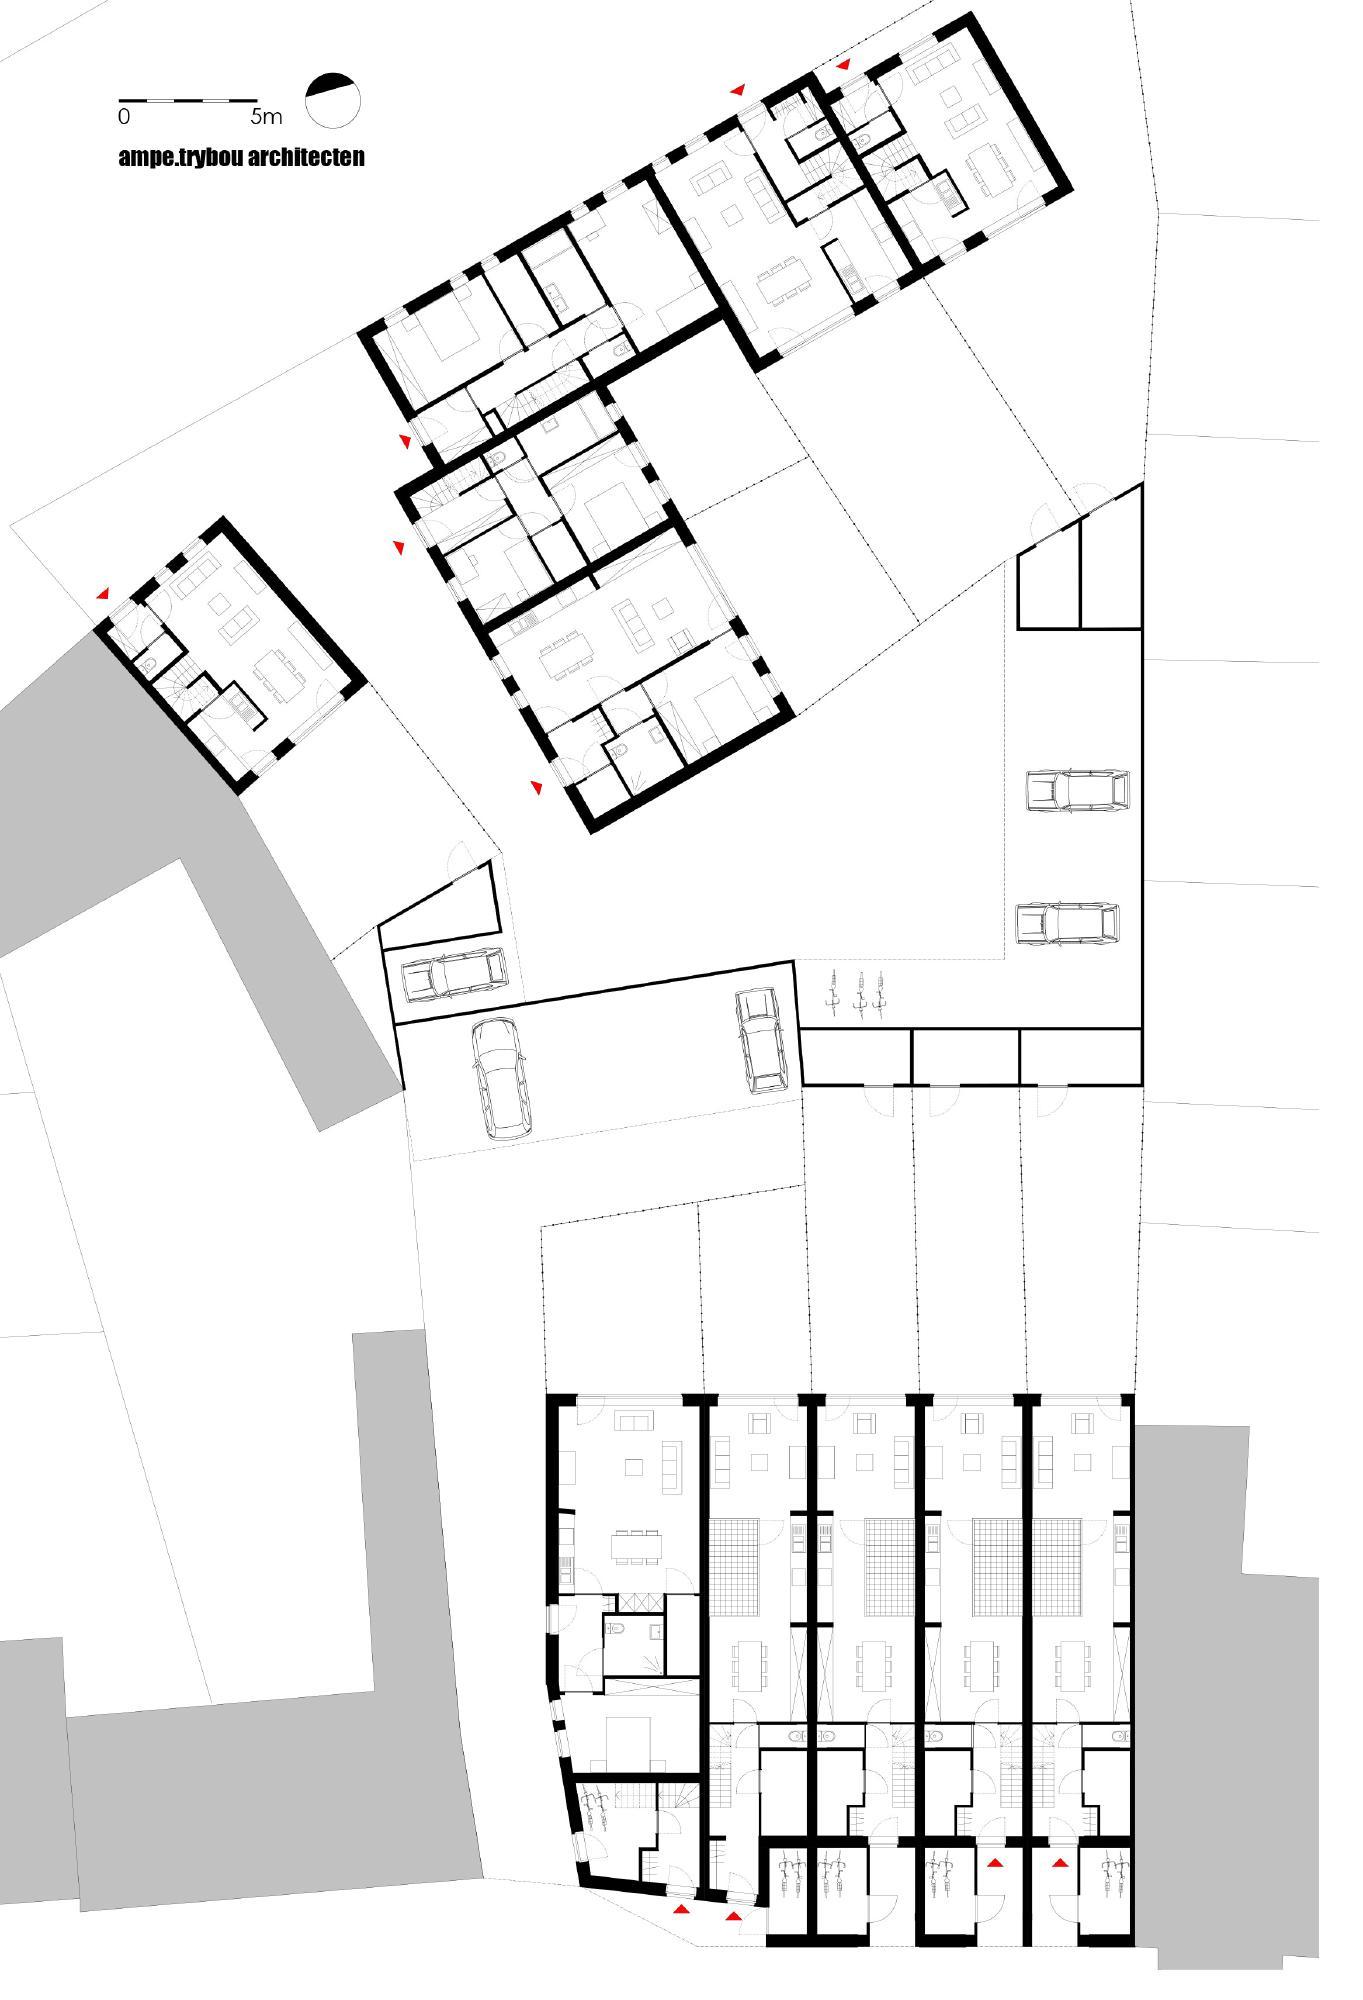 ampe.trybou architecten, Dennis De Smet · Low Energy